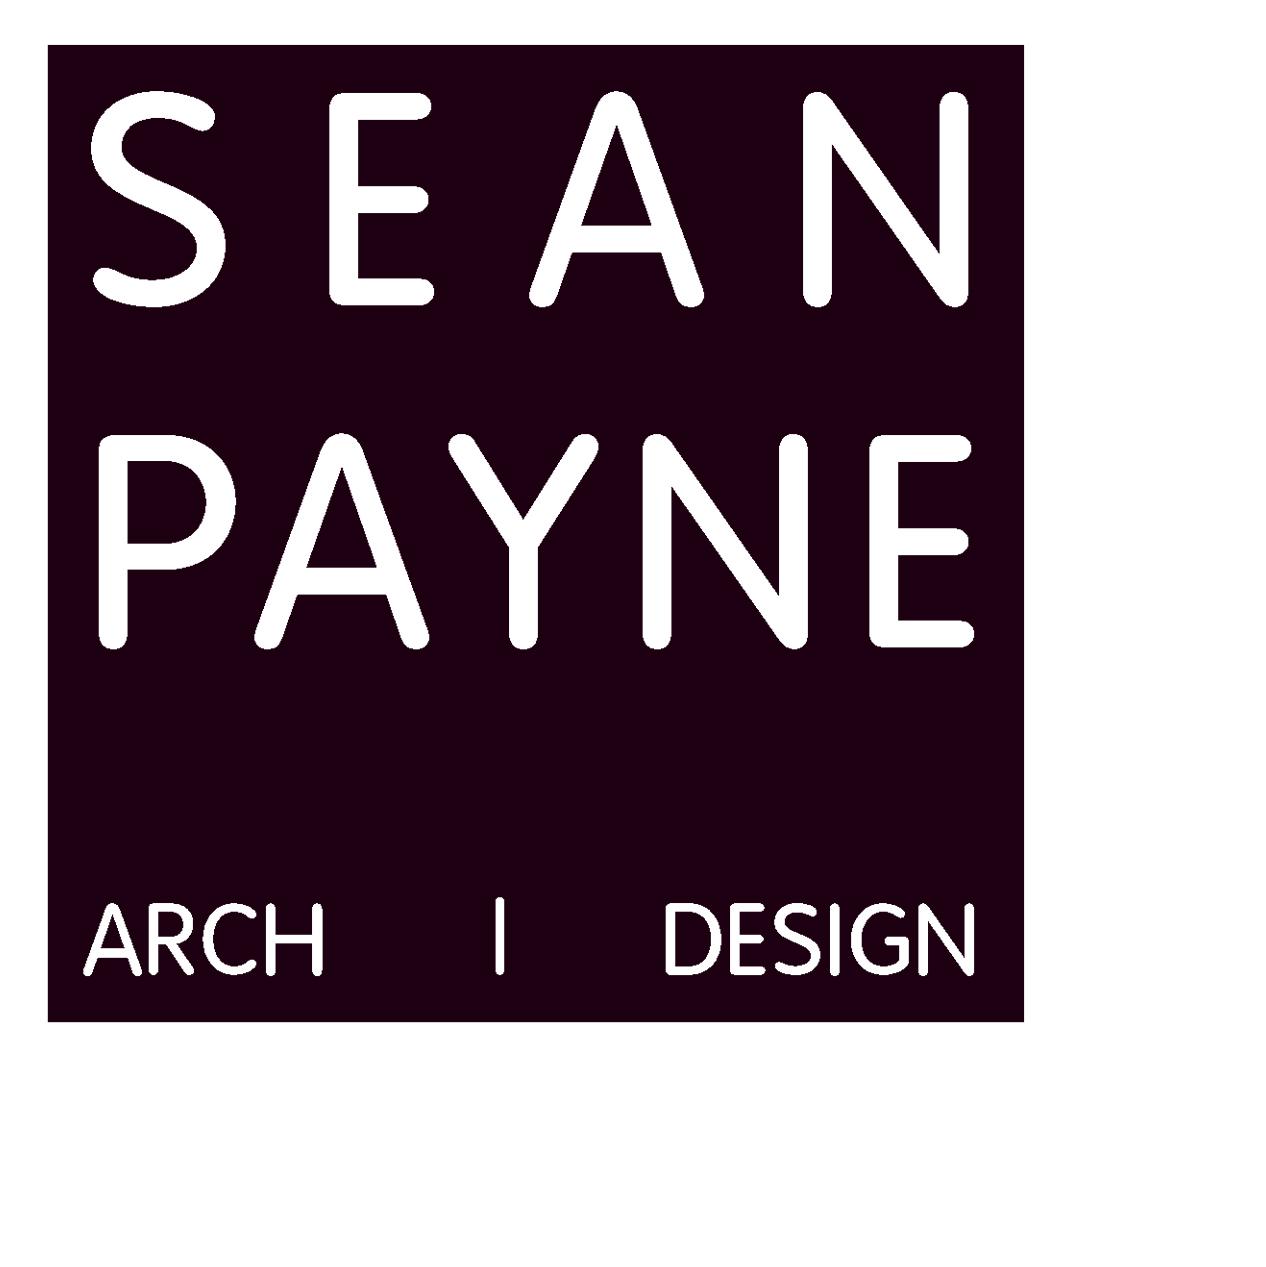 SEAN PAYNE ARCH DESIGN LTD logo.jpg